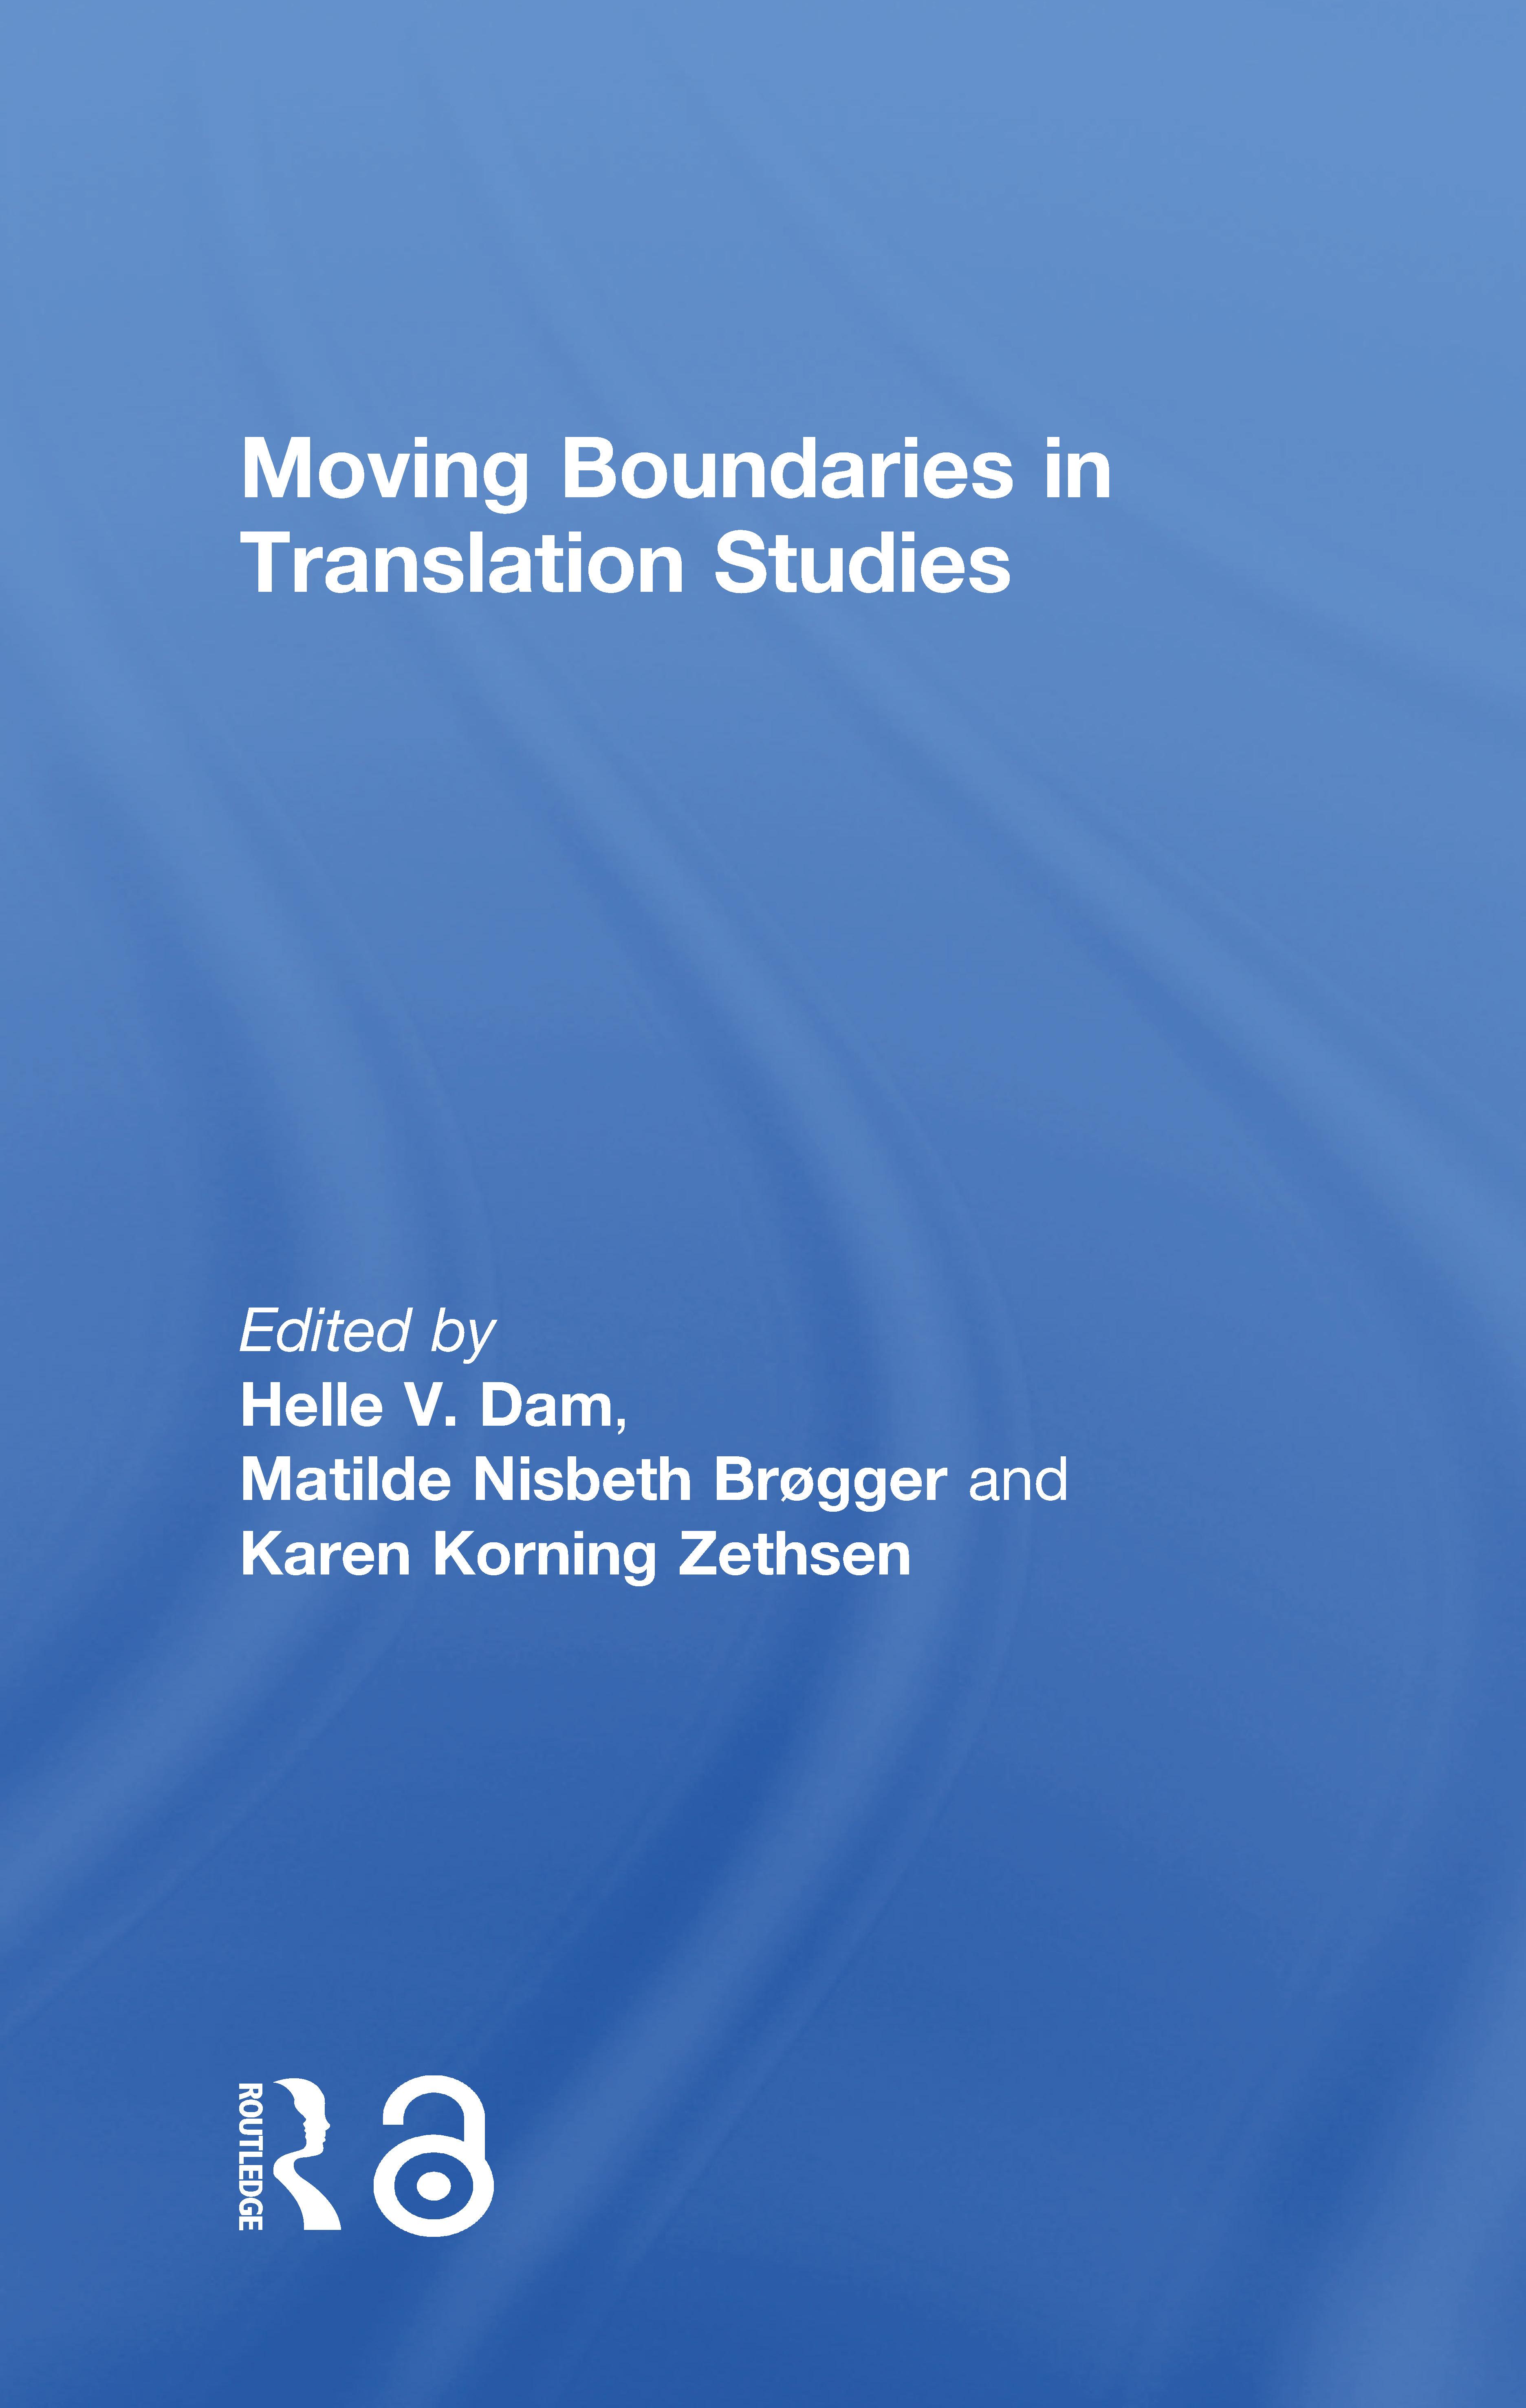 Moving Boundaries in Translation Studies book cover